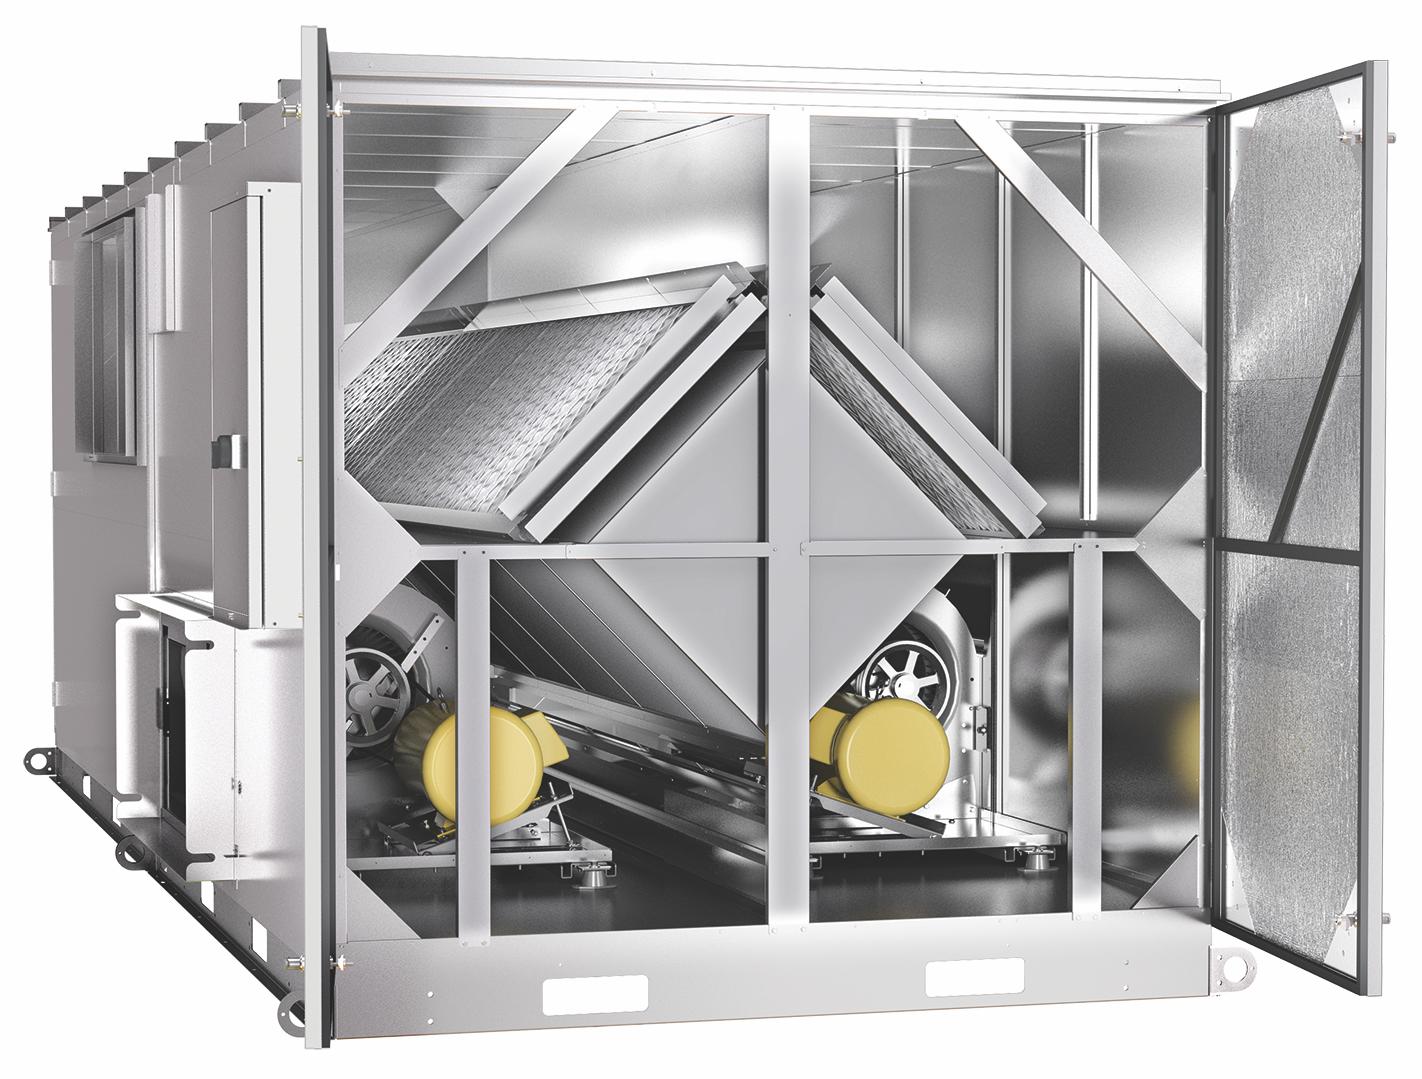 RenewAire Energy Recovery Ventilator (ERV)